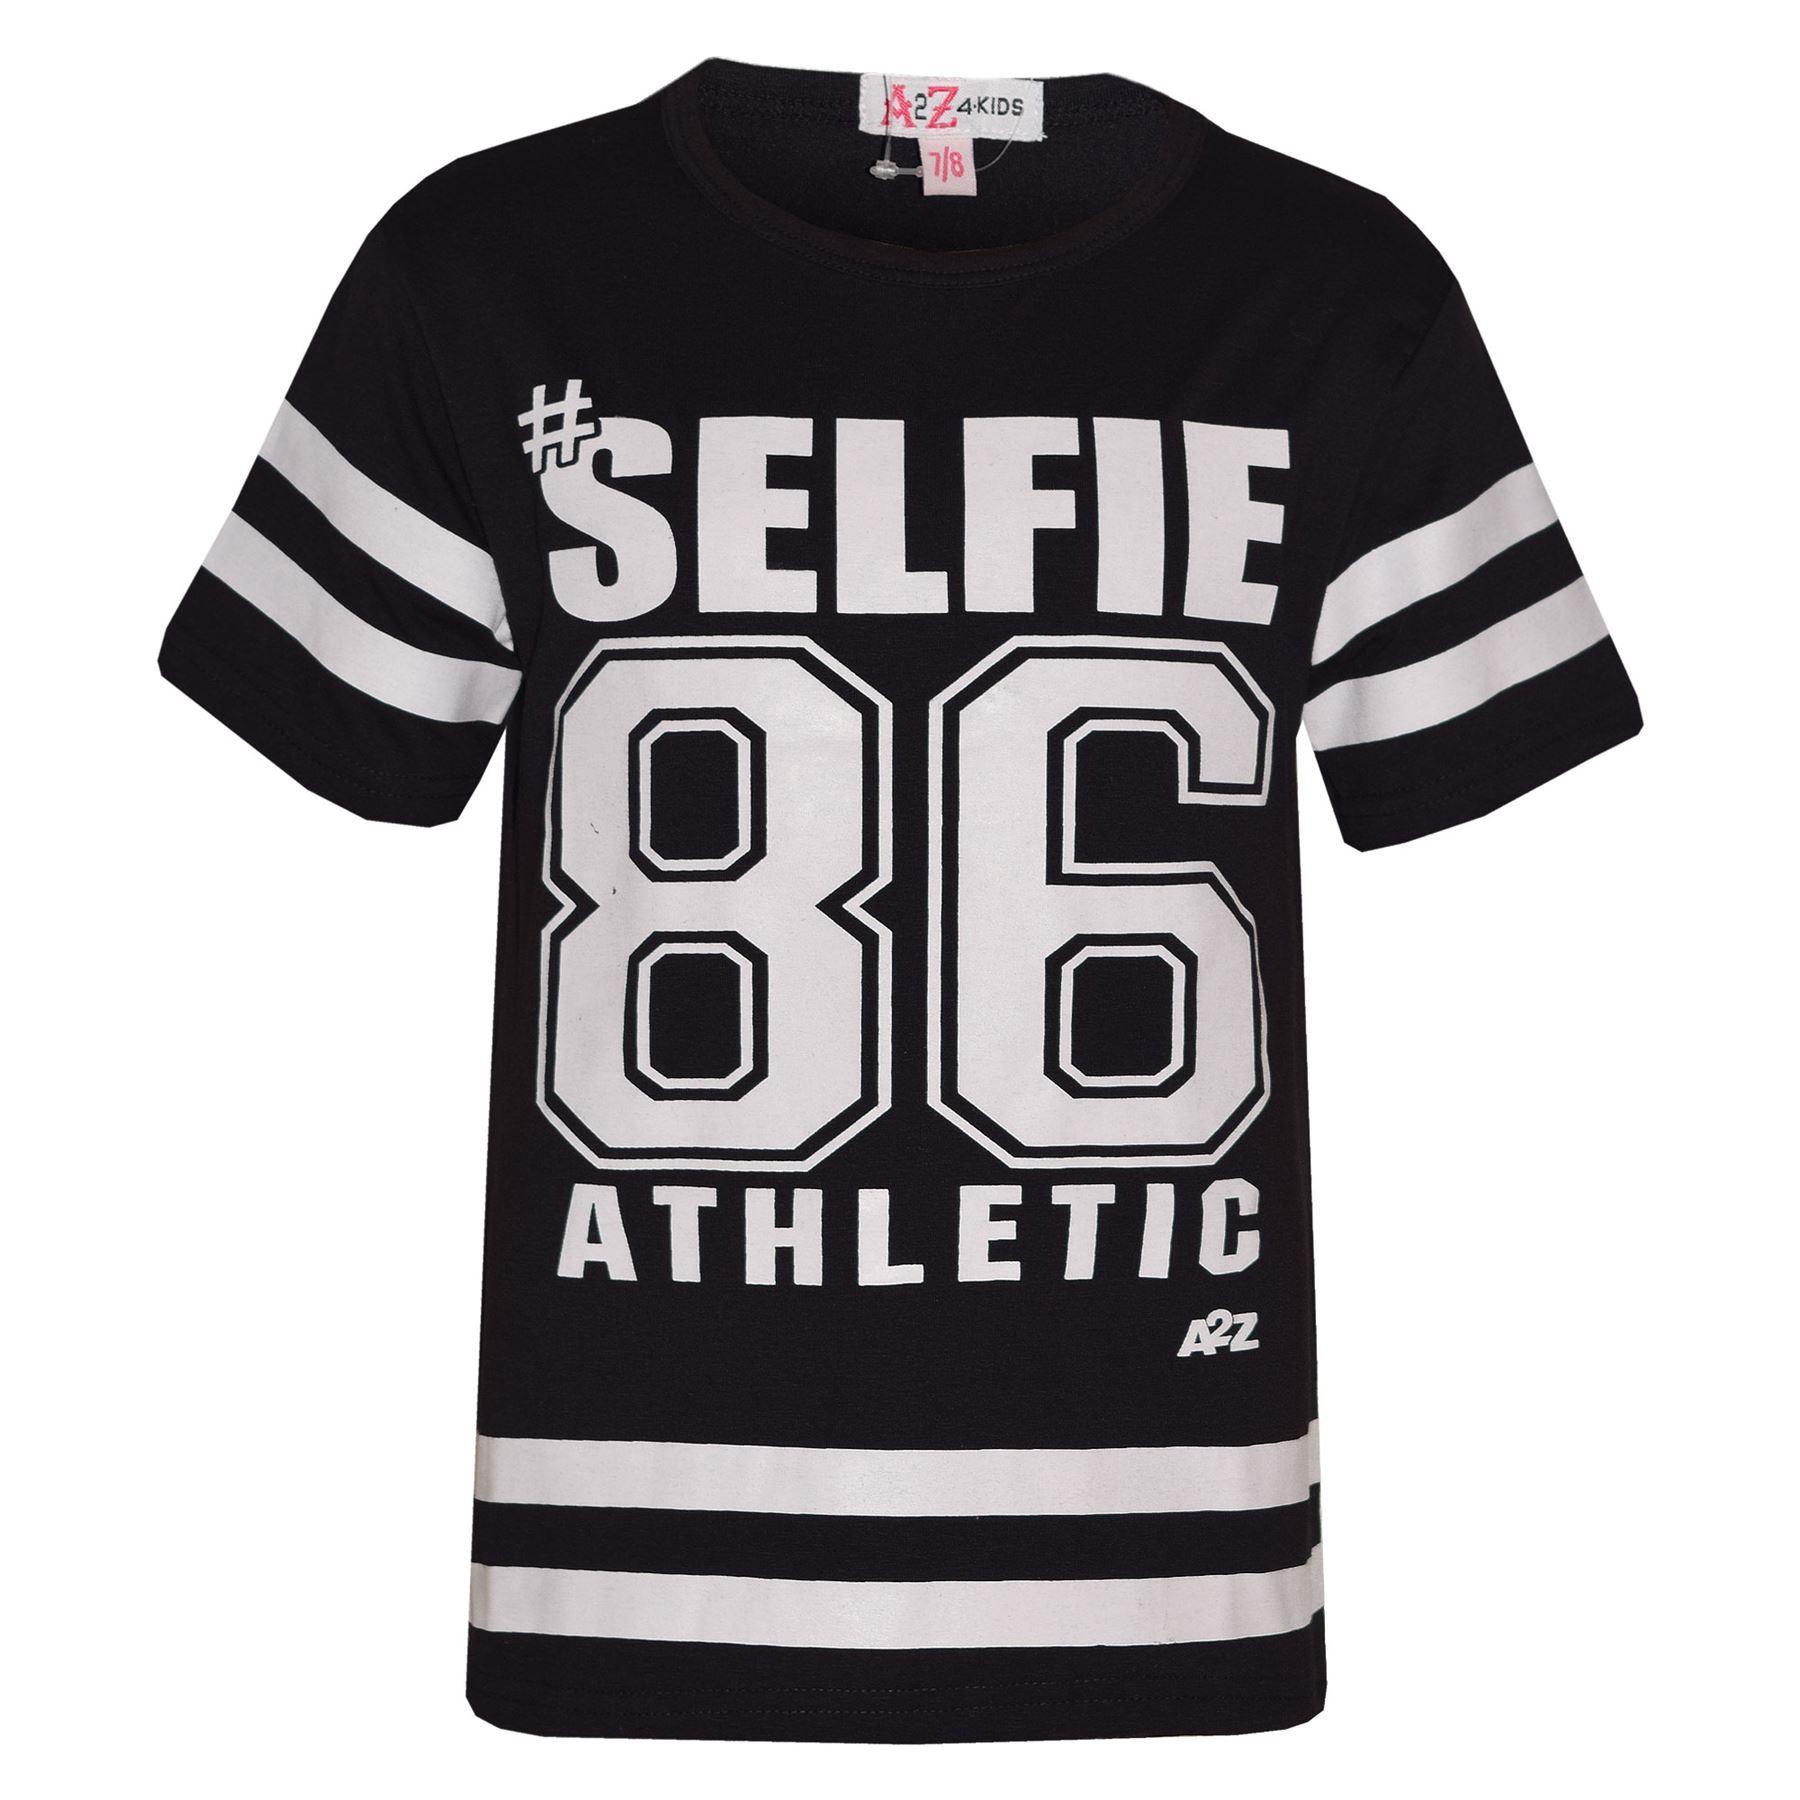 Girls Top Kids Designer/'s #Selfie 86 Athletic T Shirt Top /& Legging Set 7-13 Yr